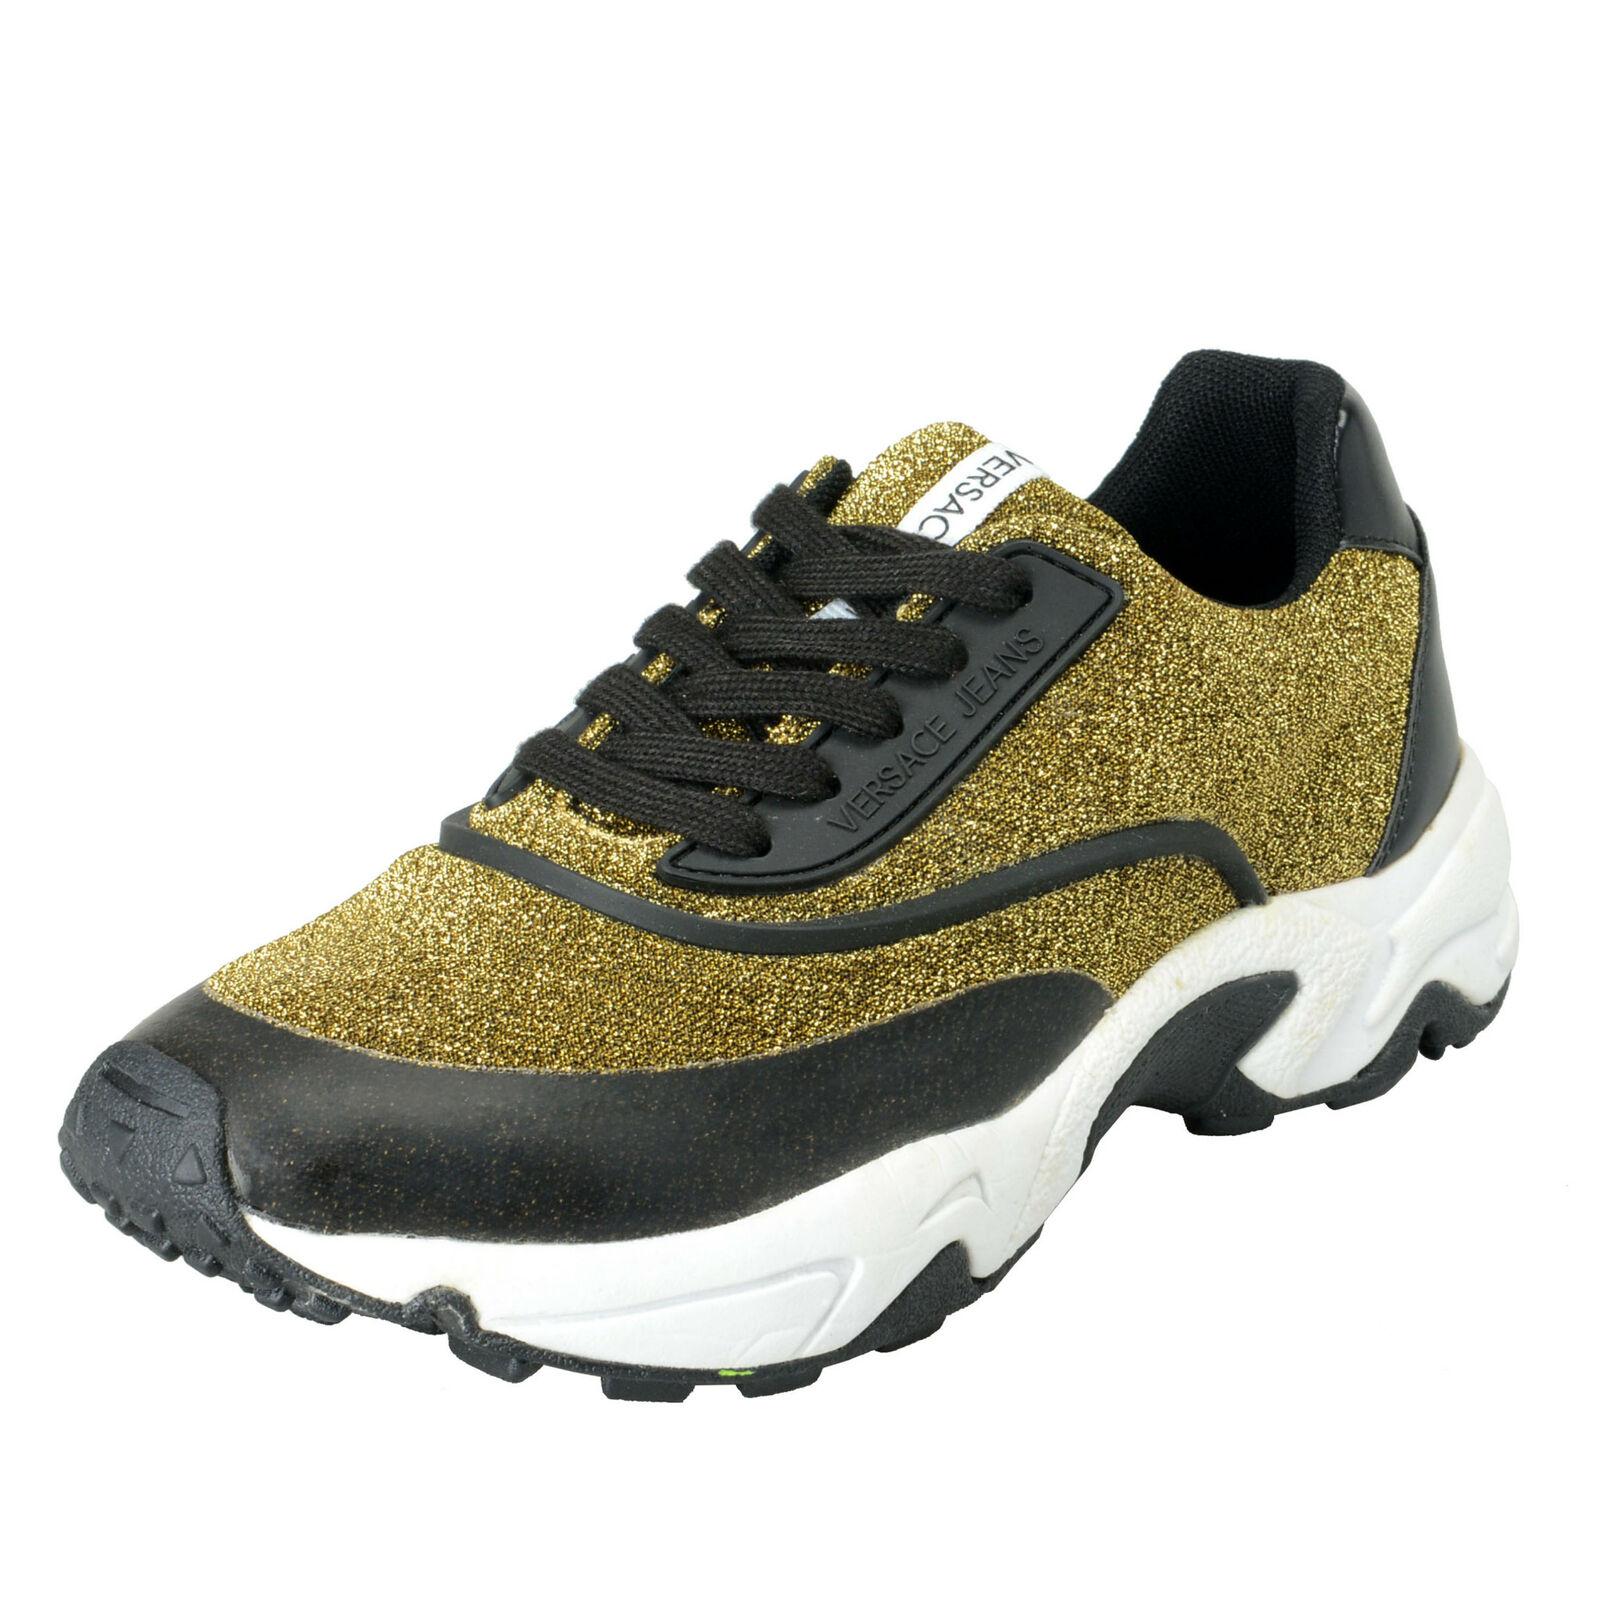 Versace Jeans Women's gold & Black Mesh Fashion Sneakers shoes Sz 7 8 9 10 11